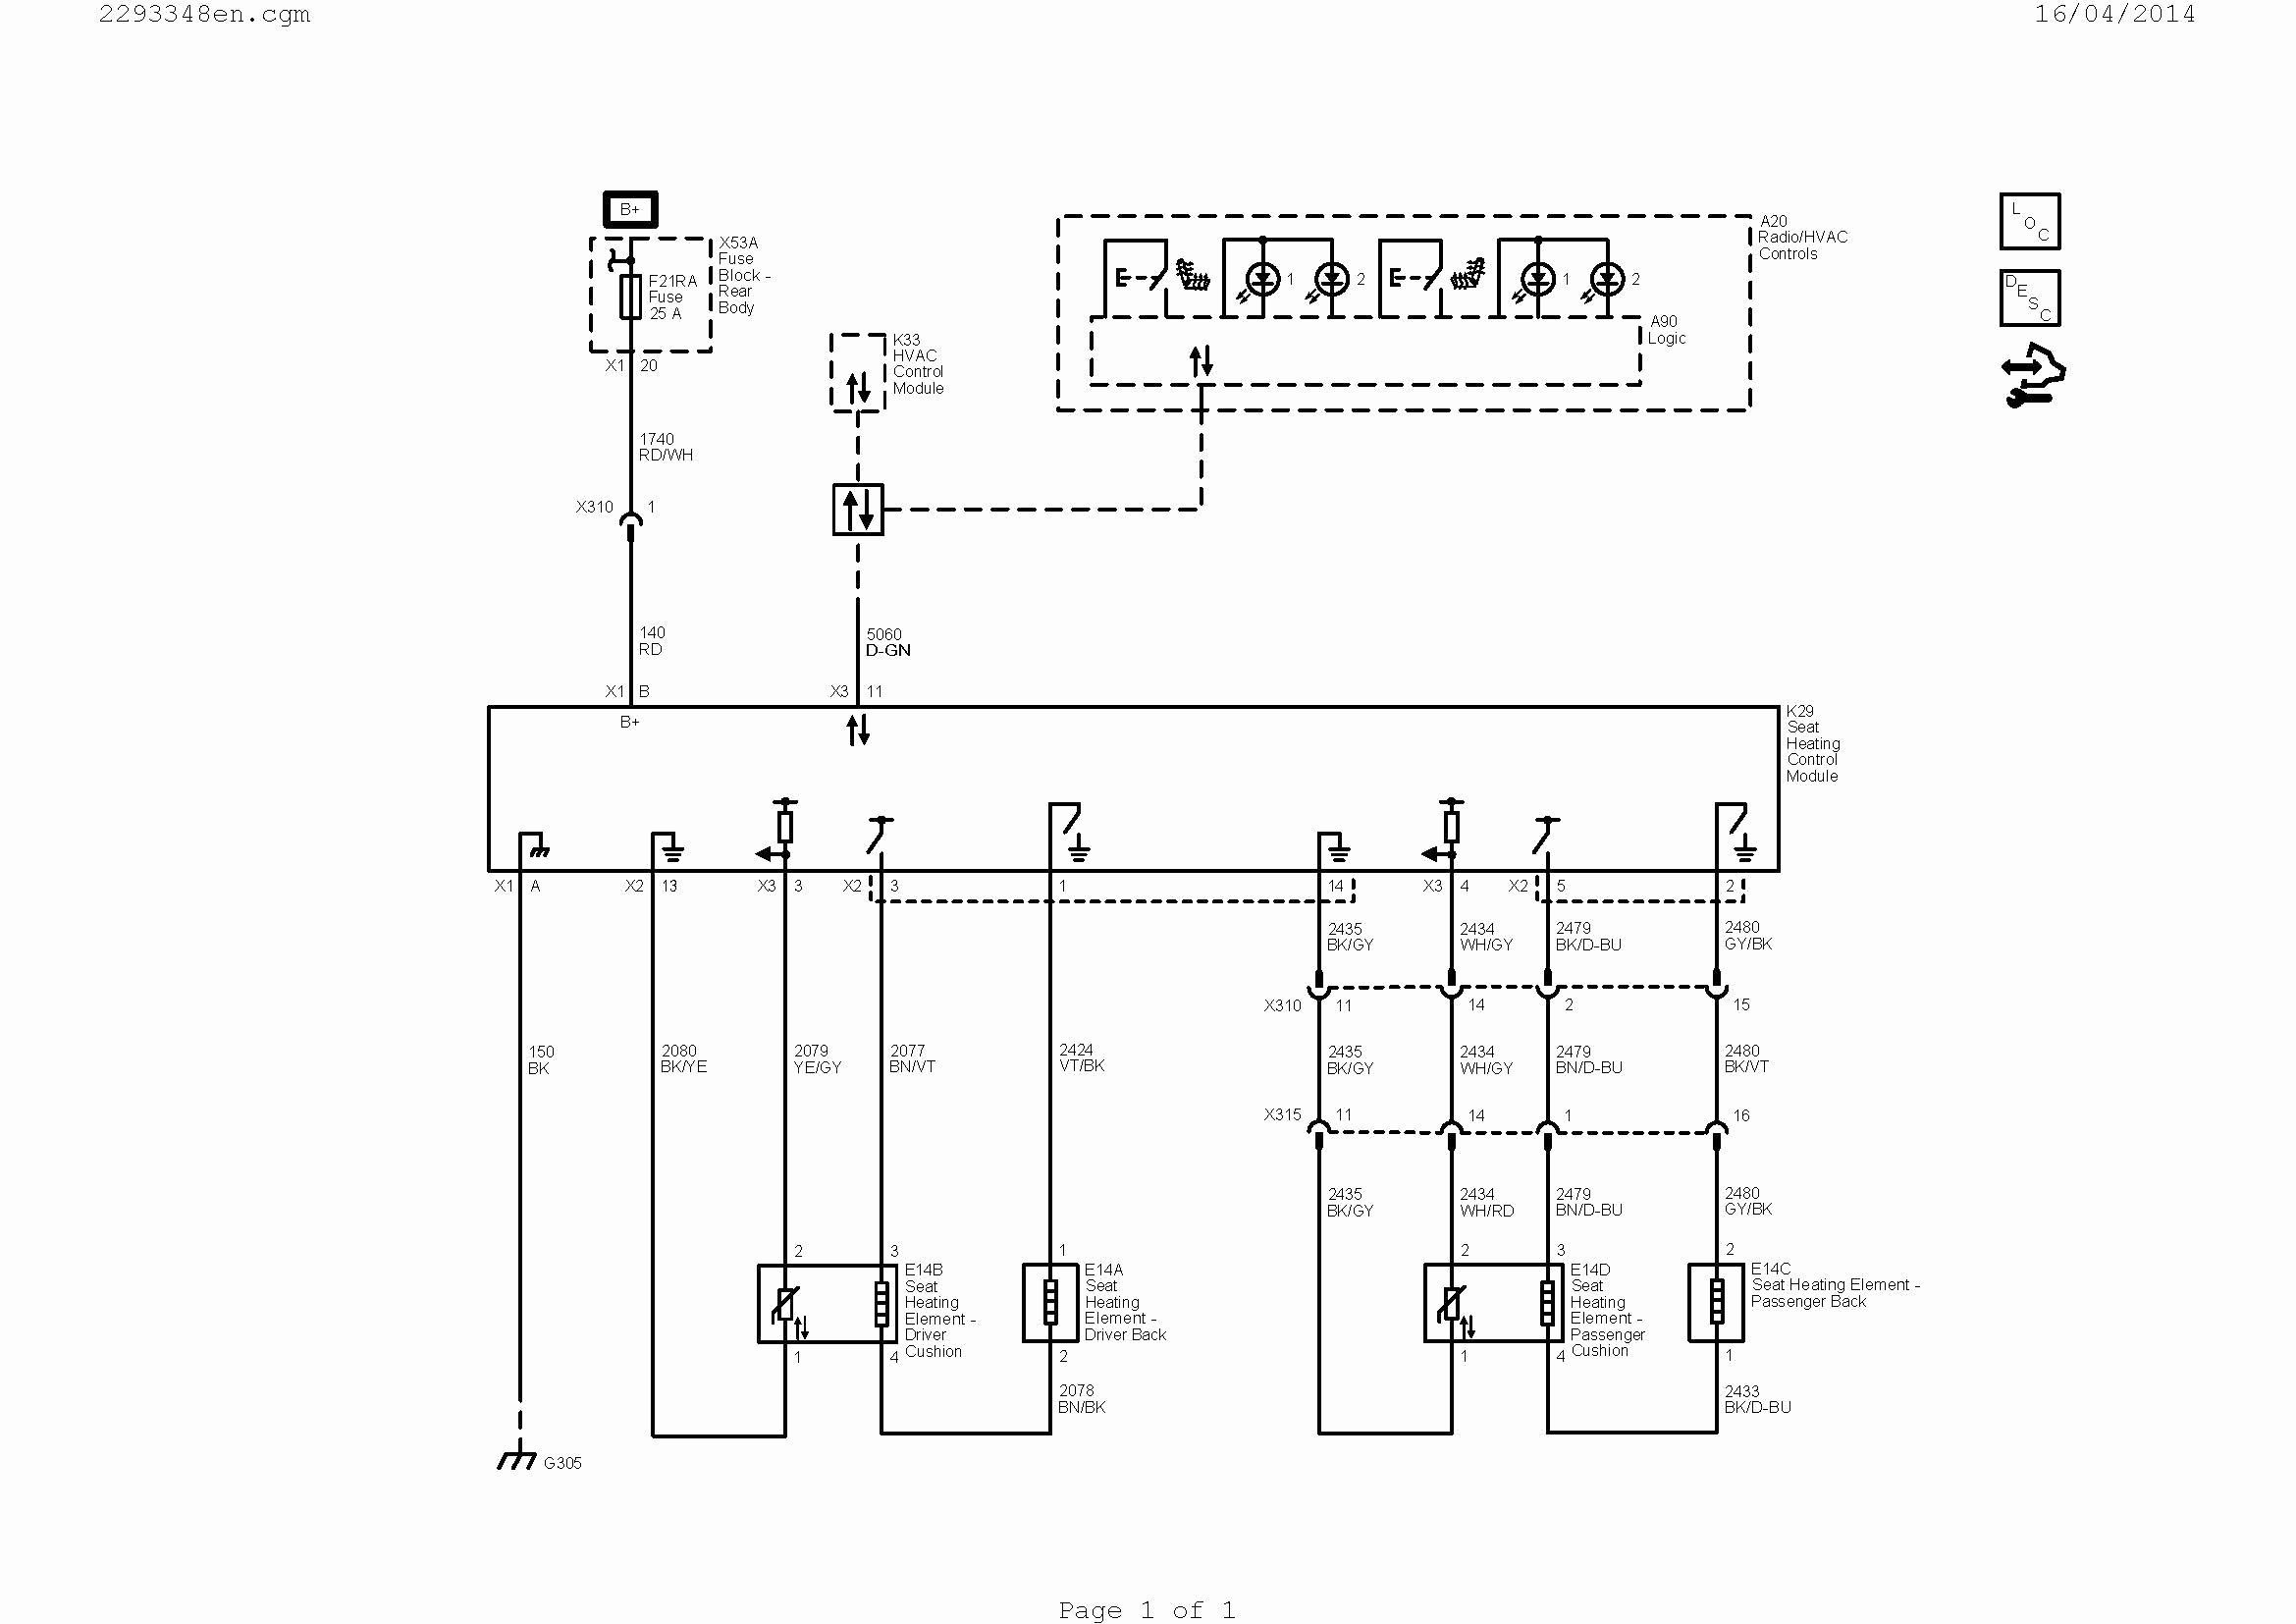 4 Way Trailer Wiring Diagram 60 Lovely Wiring Diagram for Gmc Trailer Plug Of 4 Way Trailer Wiring Diagram